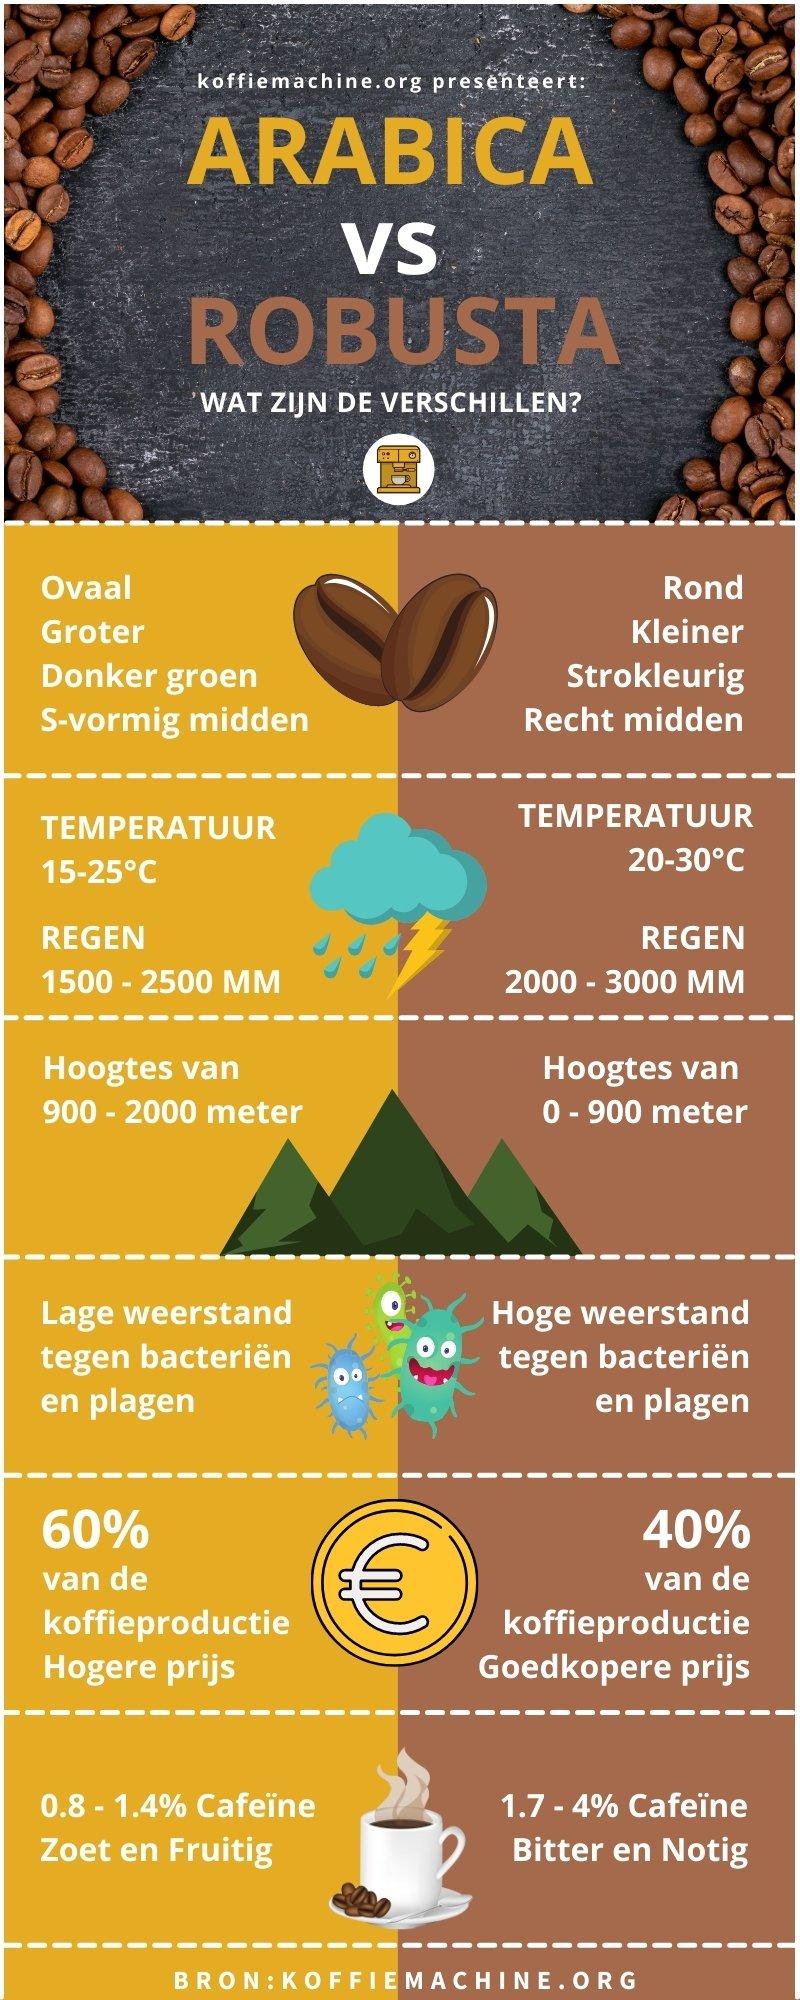 Infographic Arabica vs Robusta koffiebonen van Koffiemachine.org